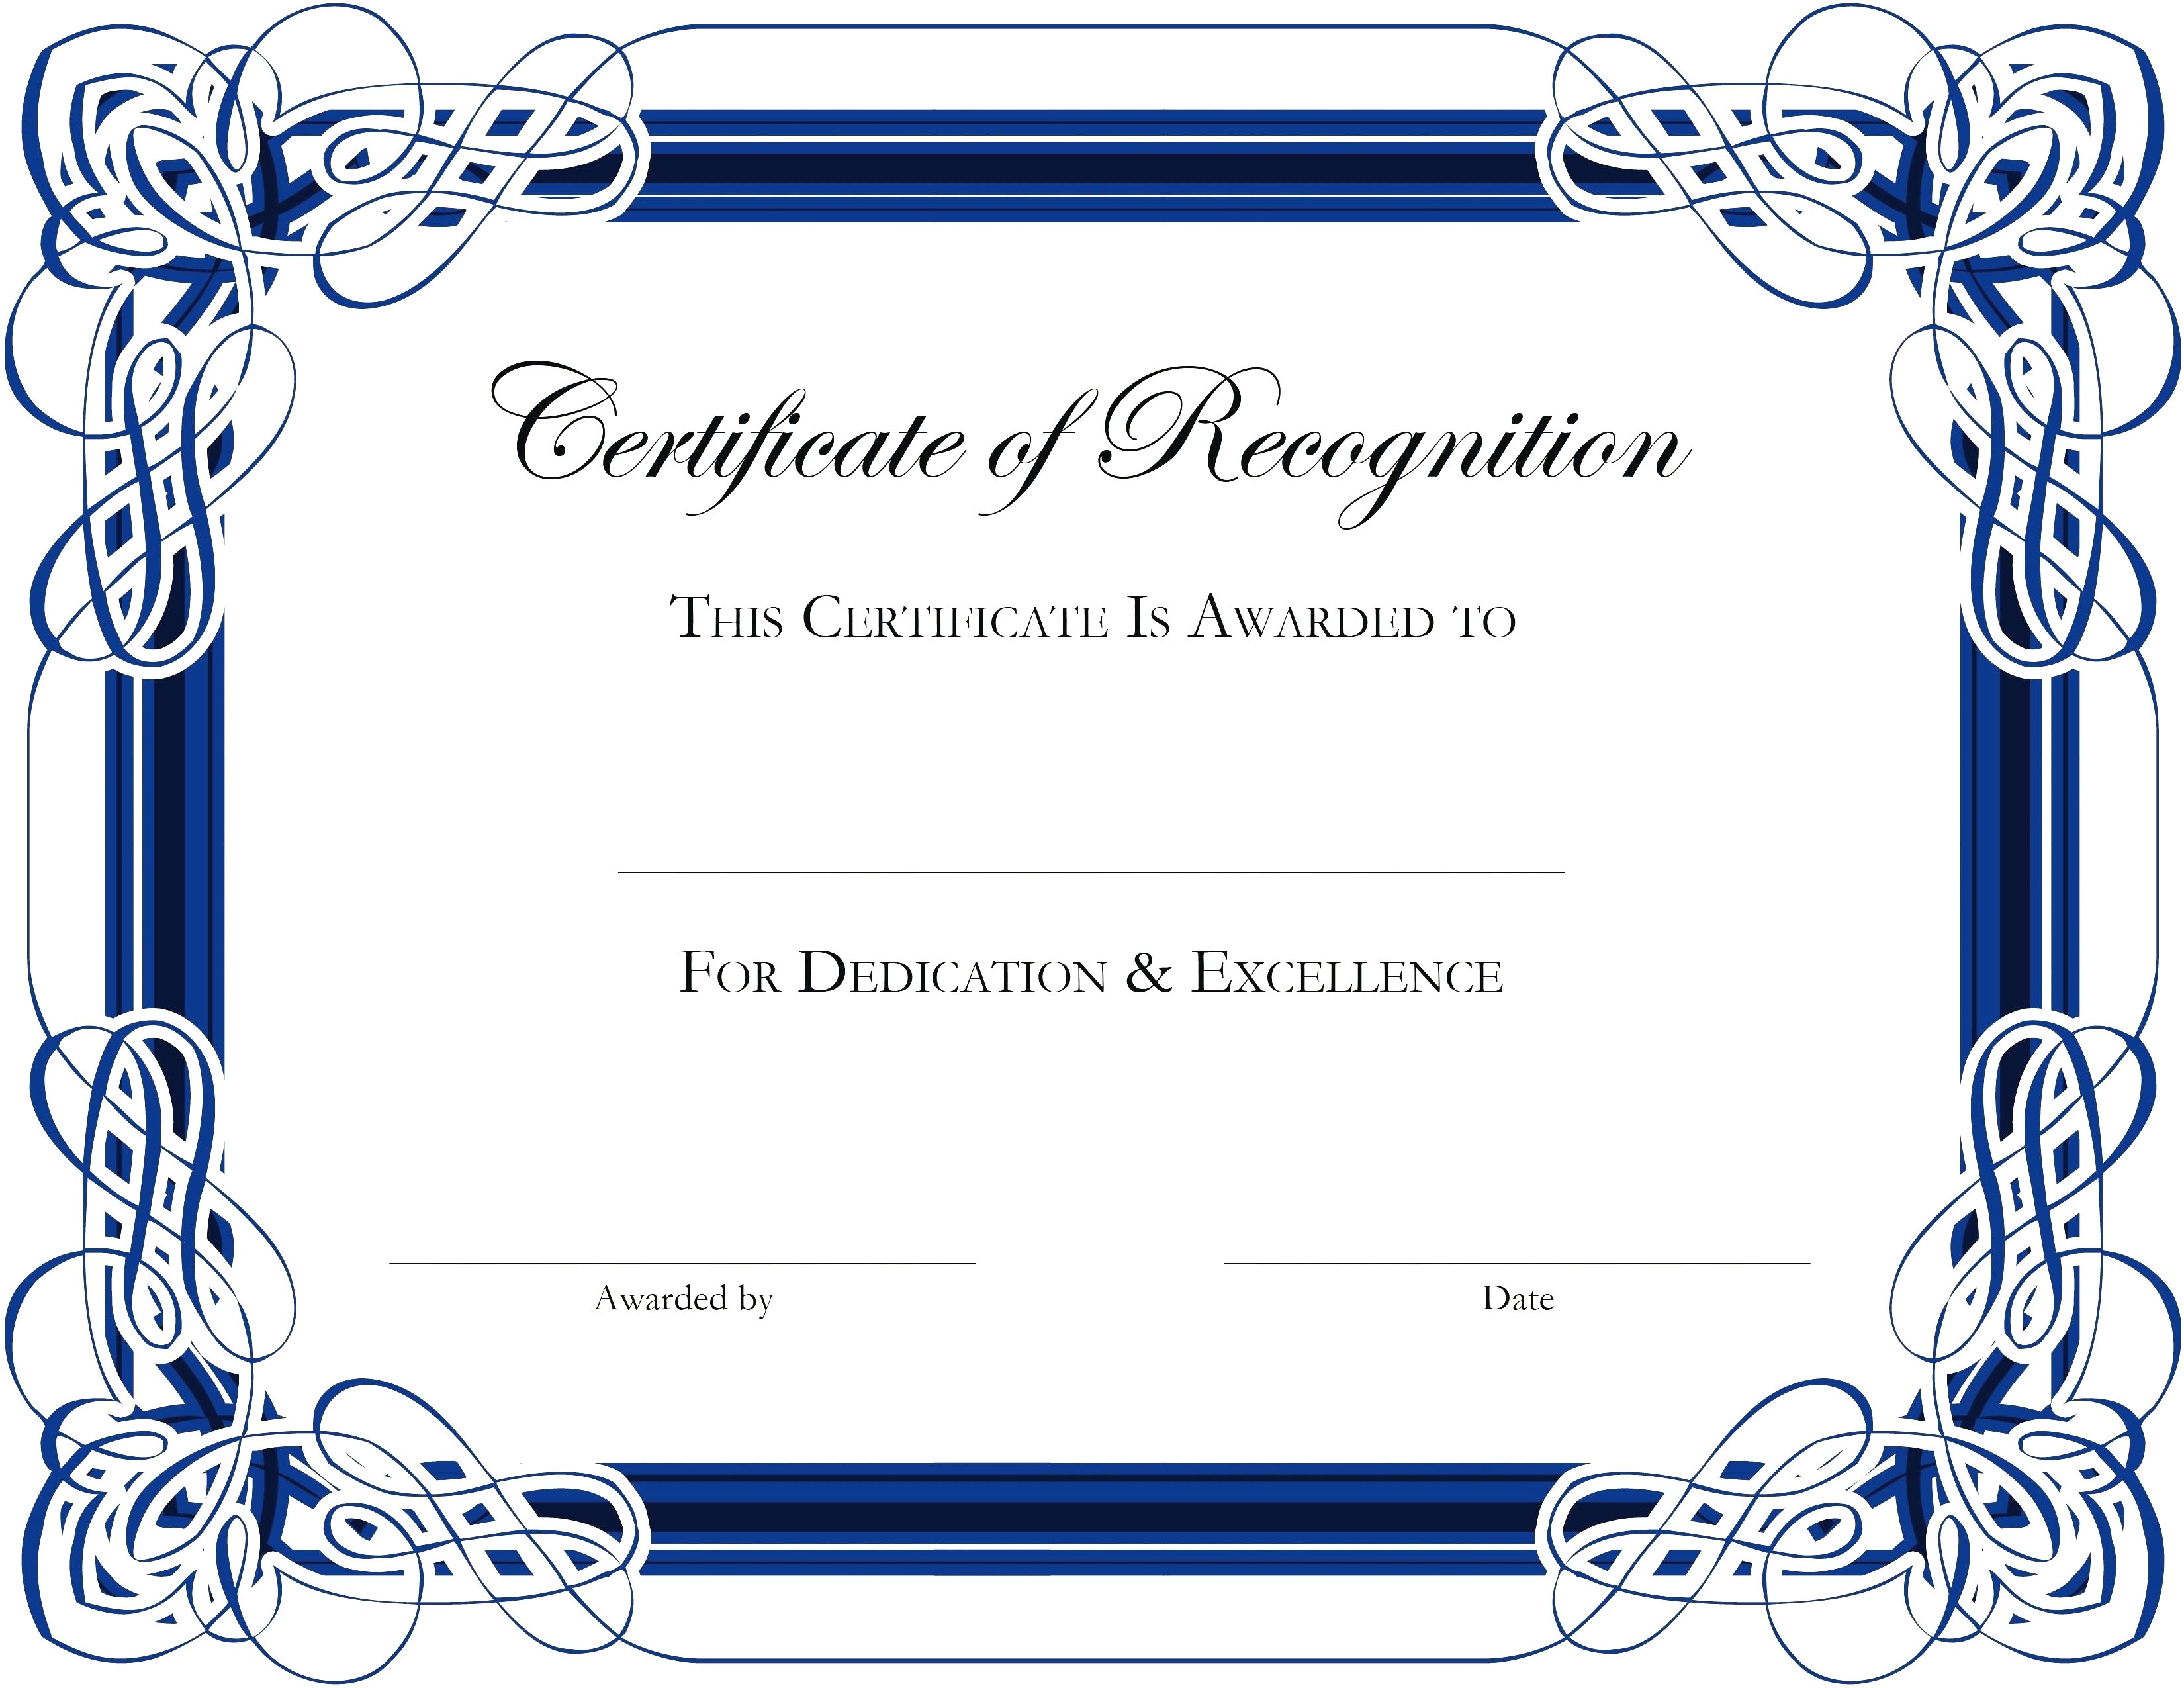 Award Certificate Templates Word 2007 – Atlantaauctionco Inside Award Certificate Templates Word 2007